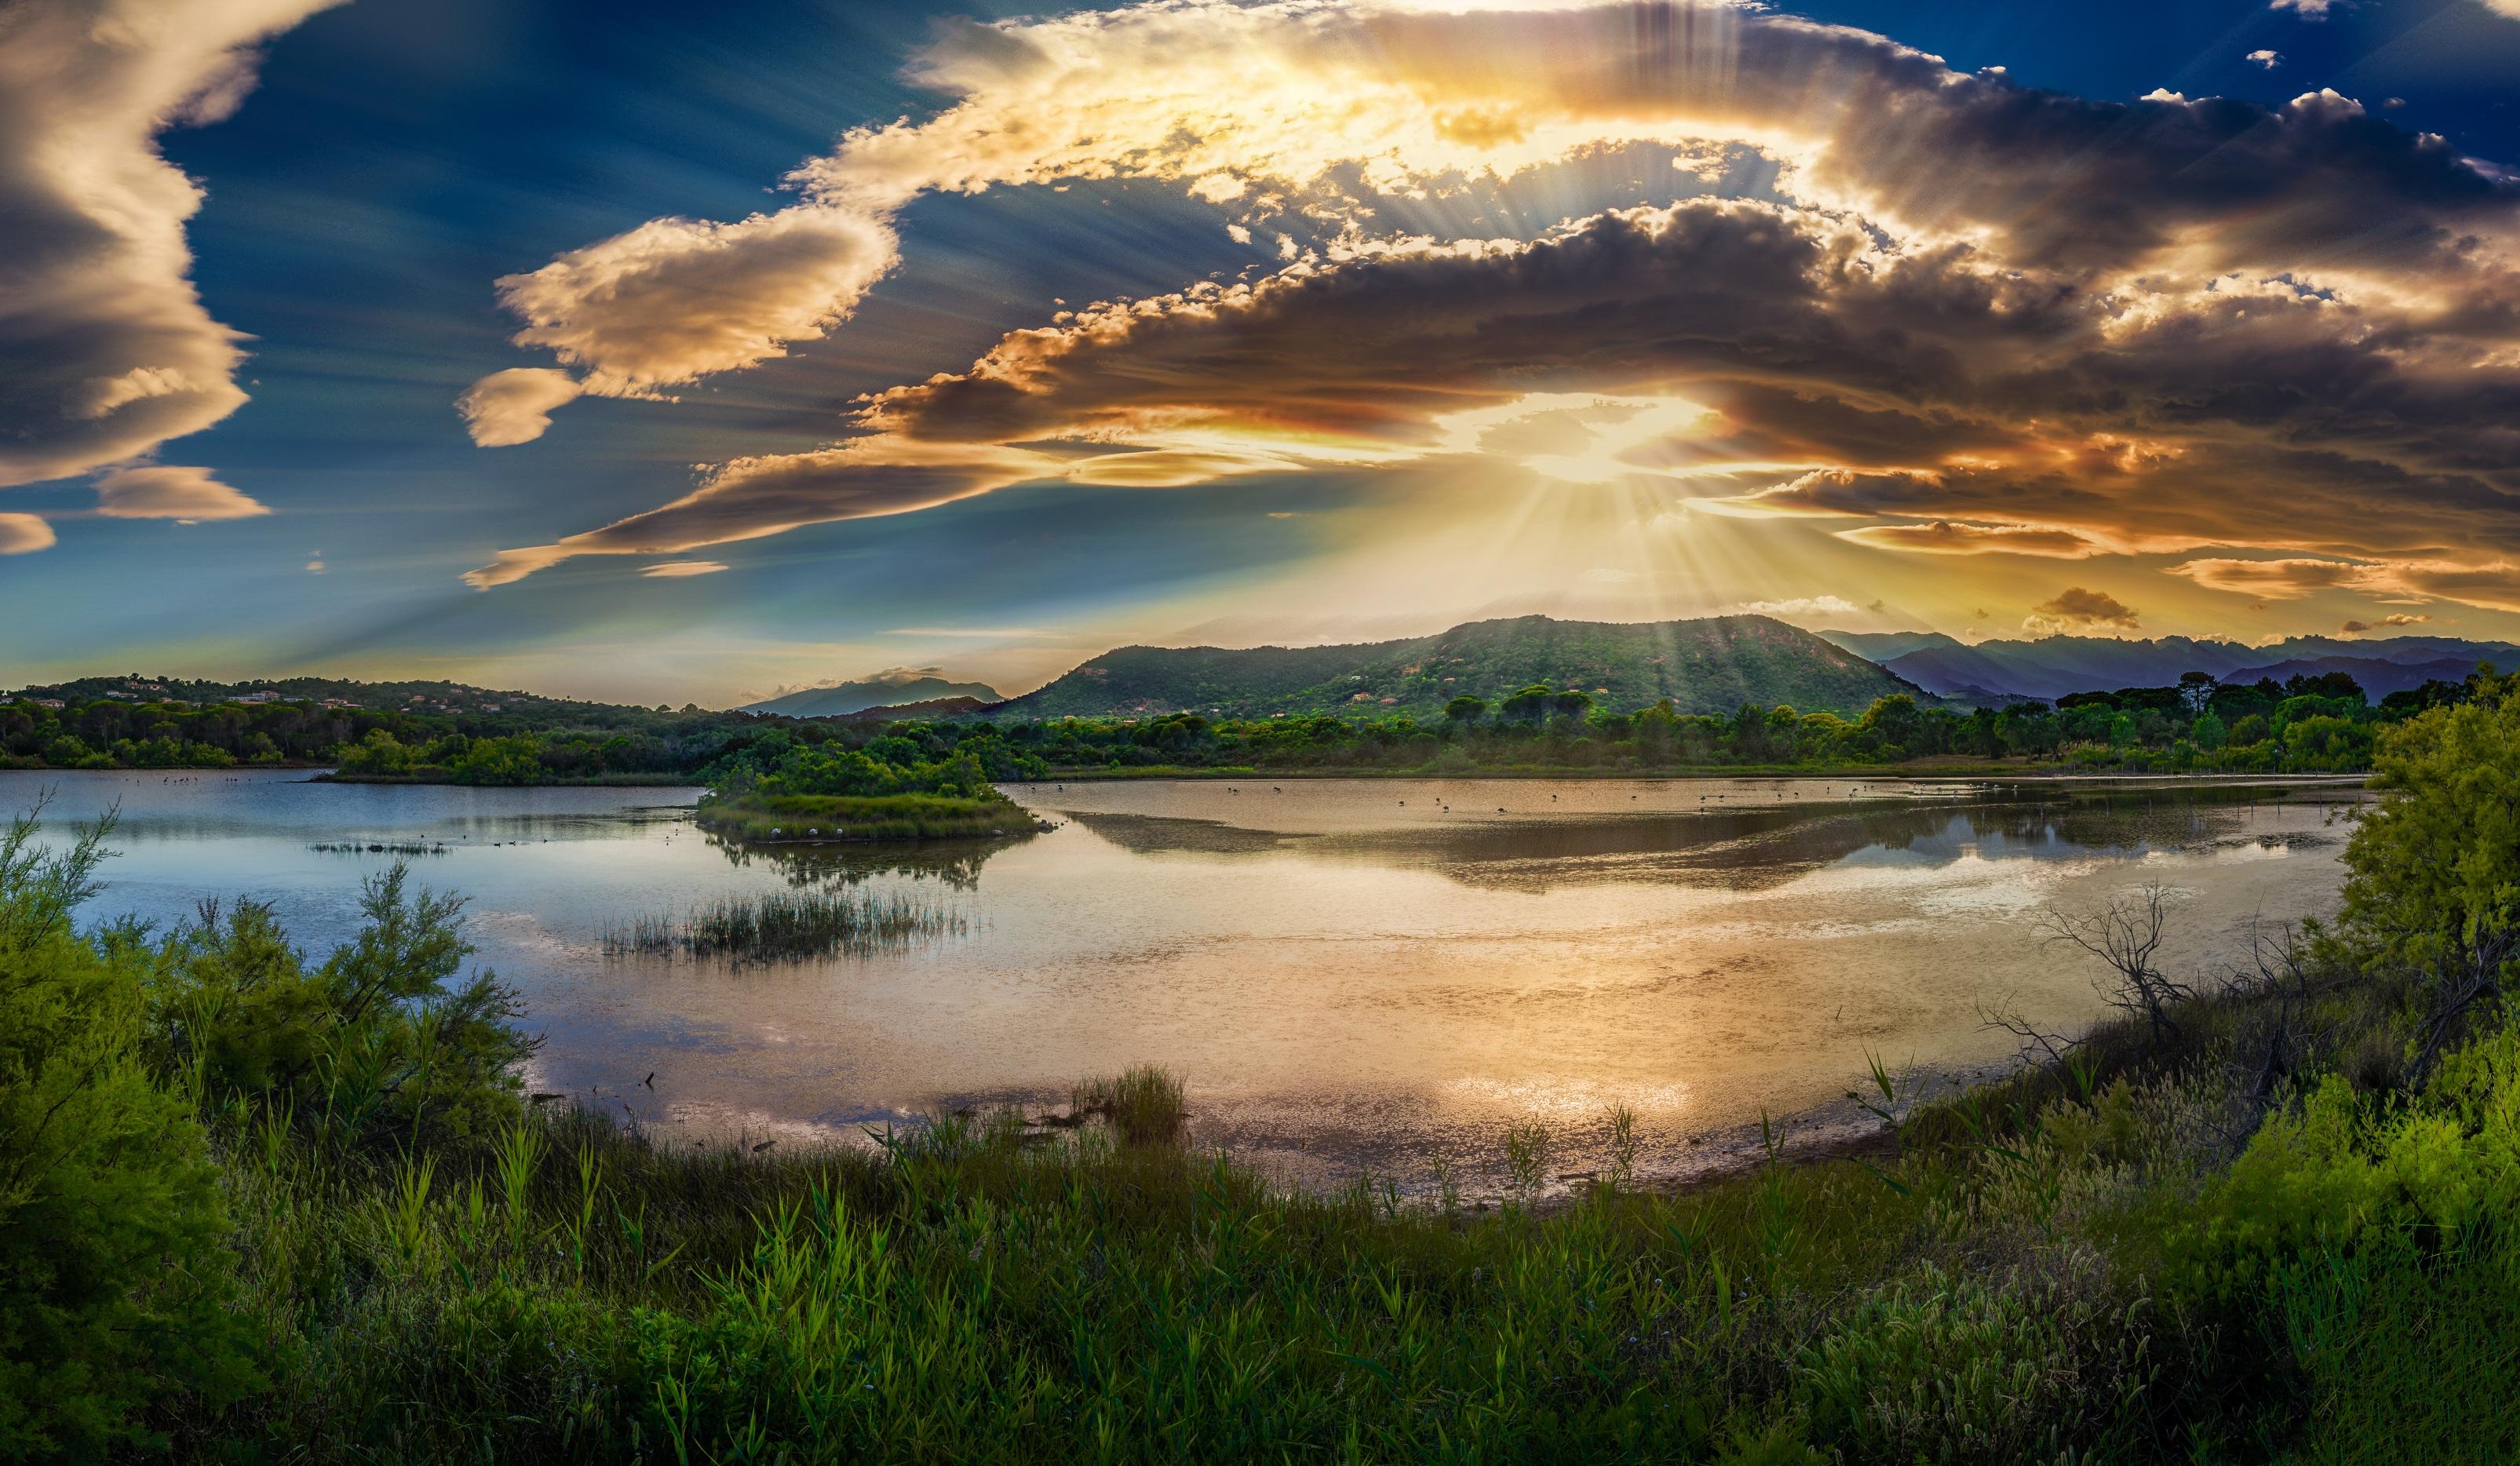 Gambar : pemandangan, laut, air, Outdoor, horison, rawa, cahaya